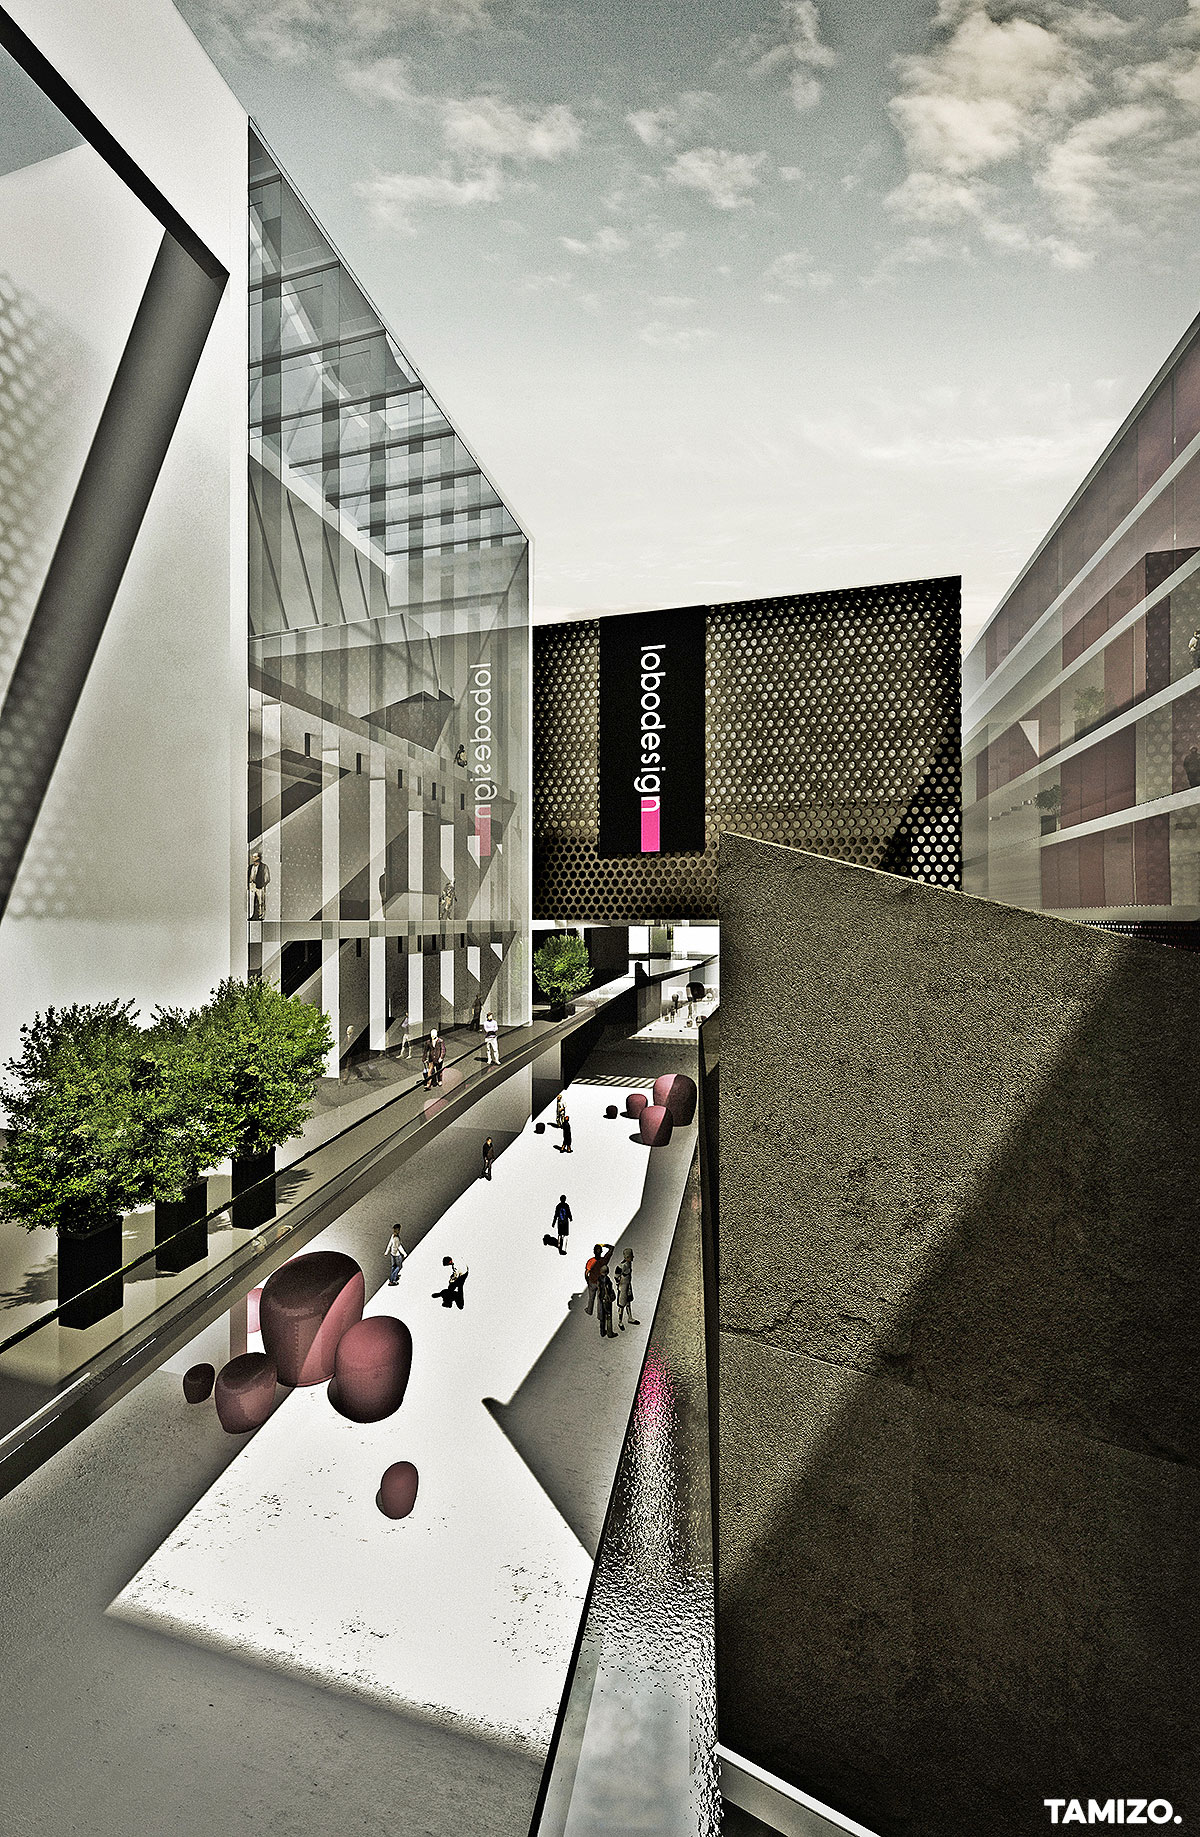 A016_tamizo_architekci_architektura-warszawa-muzeum-sztuki-nowoczesnej-konkurs-07